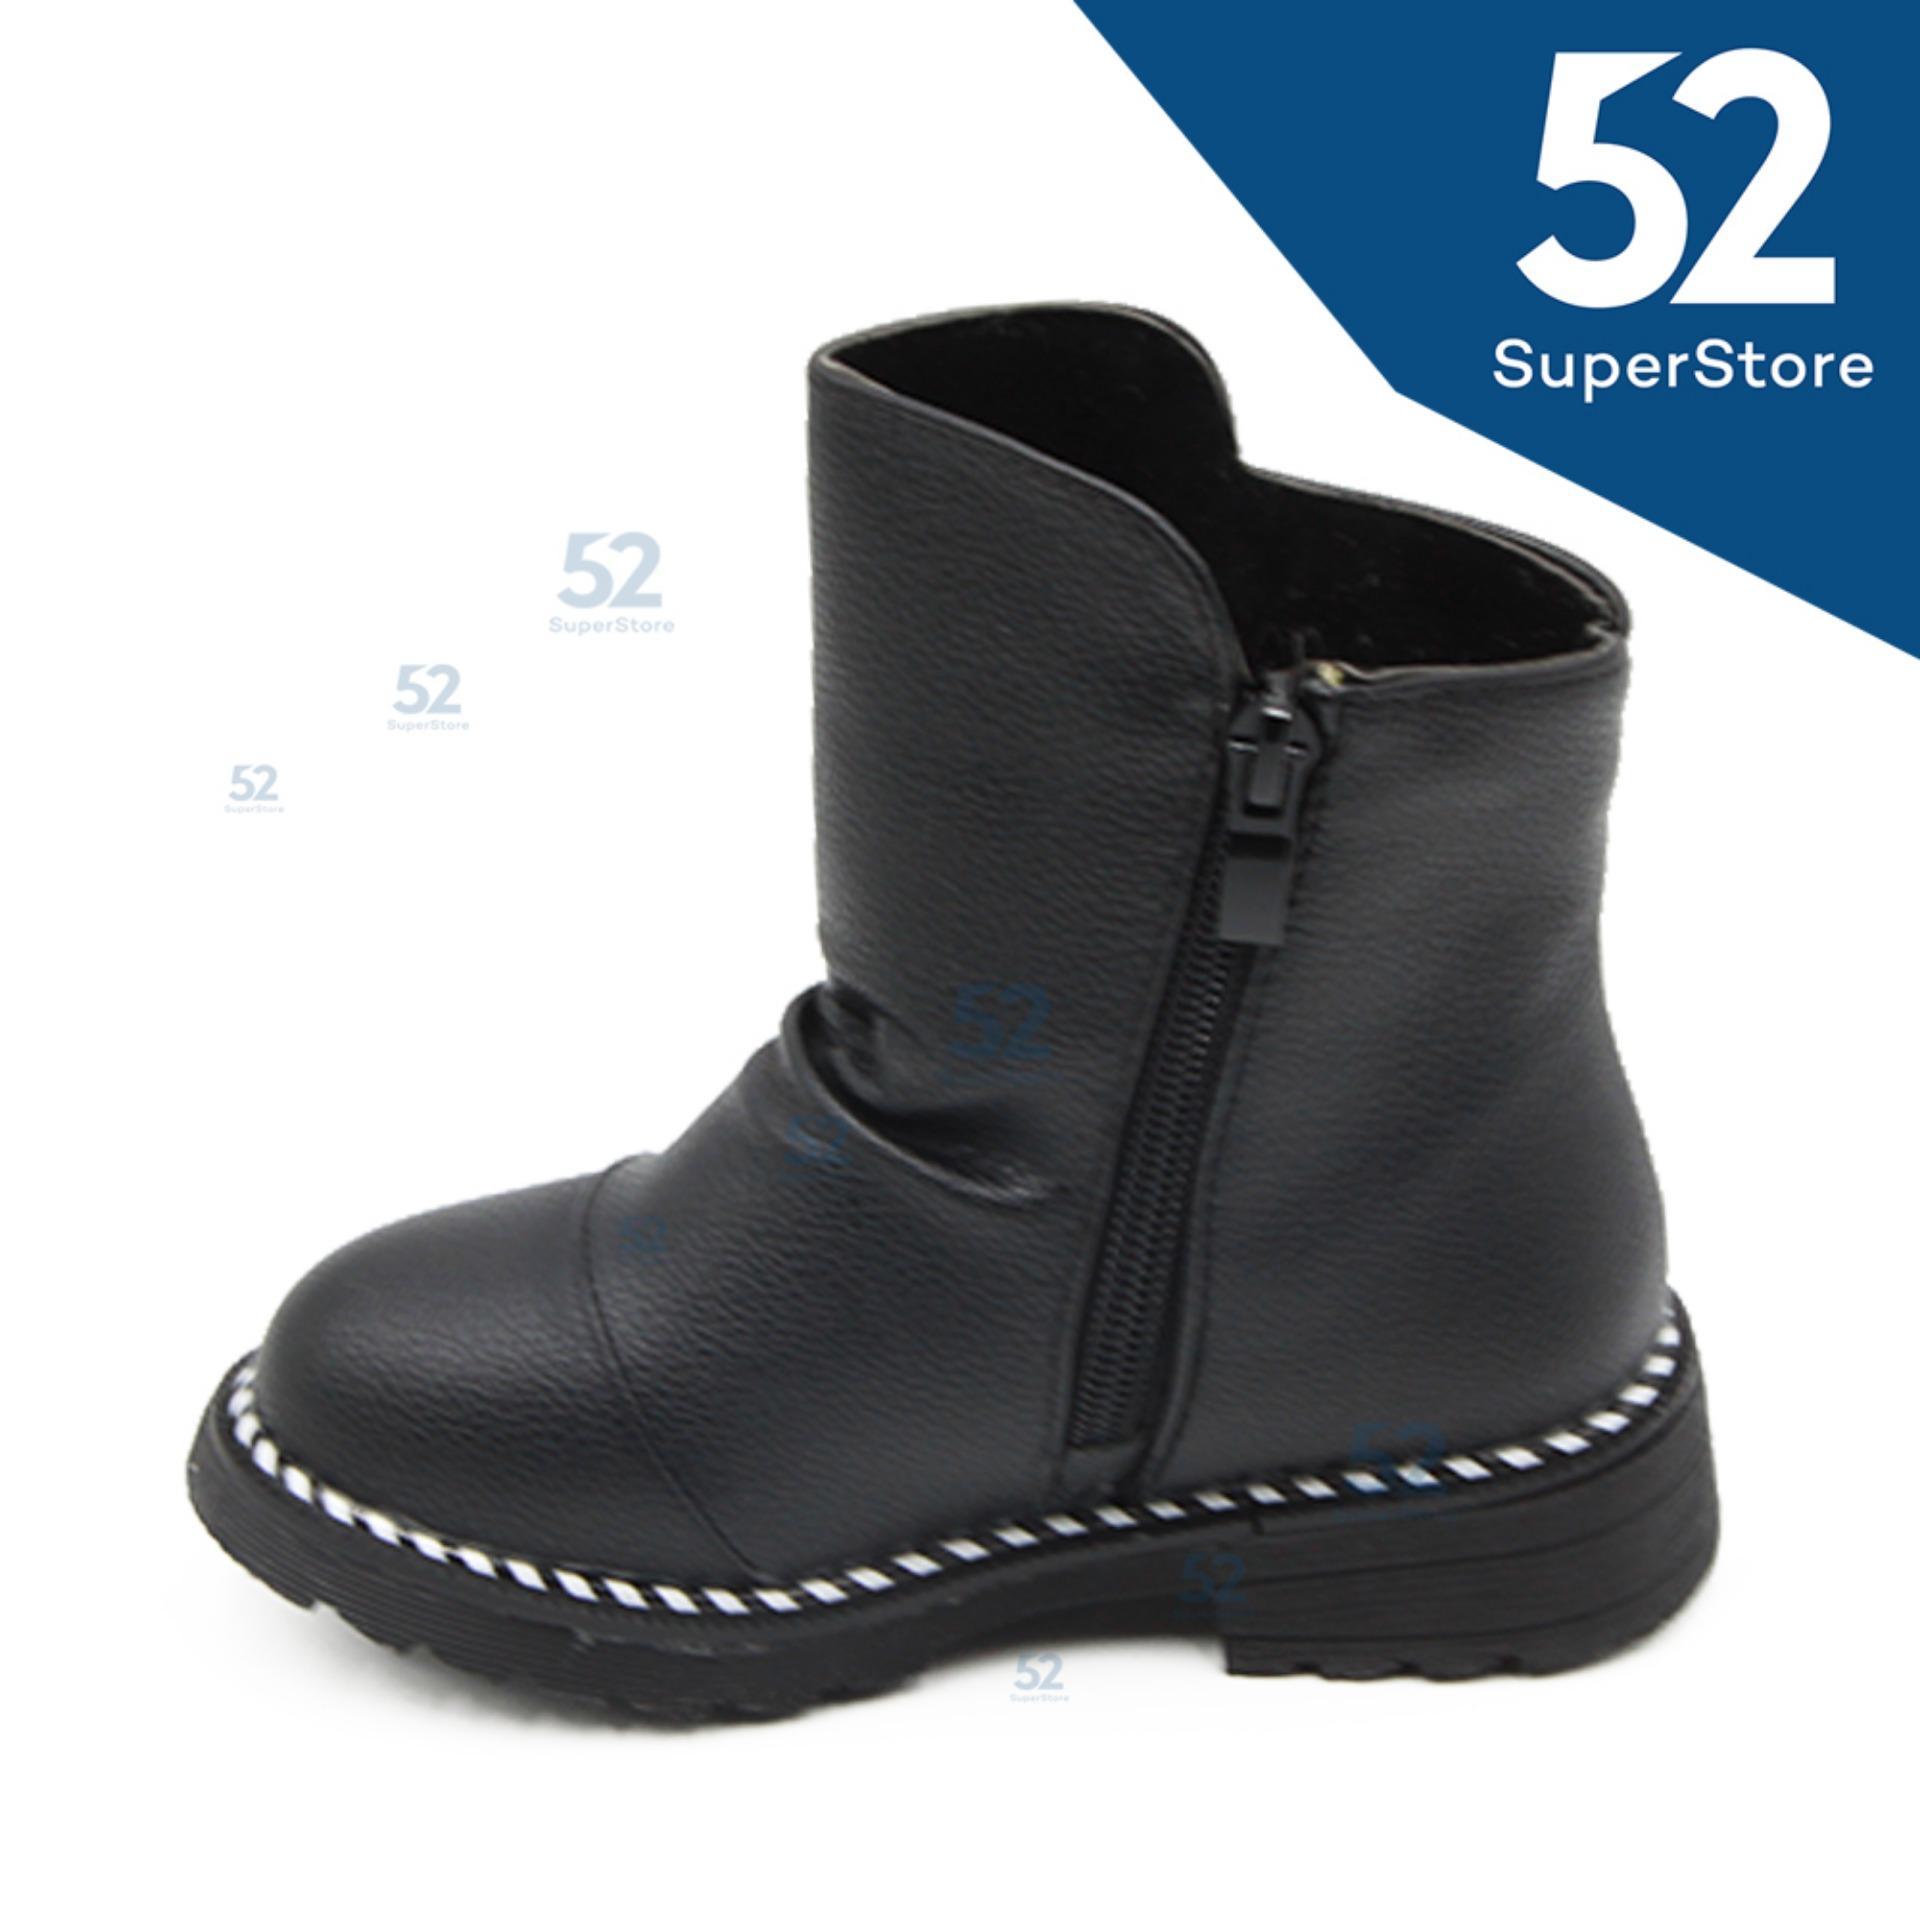 Cek Harga Baru 52 Fashion Sepatu Anak Boot 1611 111 Black Size 26 31 Sandal Laki 1604 306 Brown 4